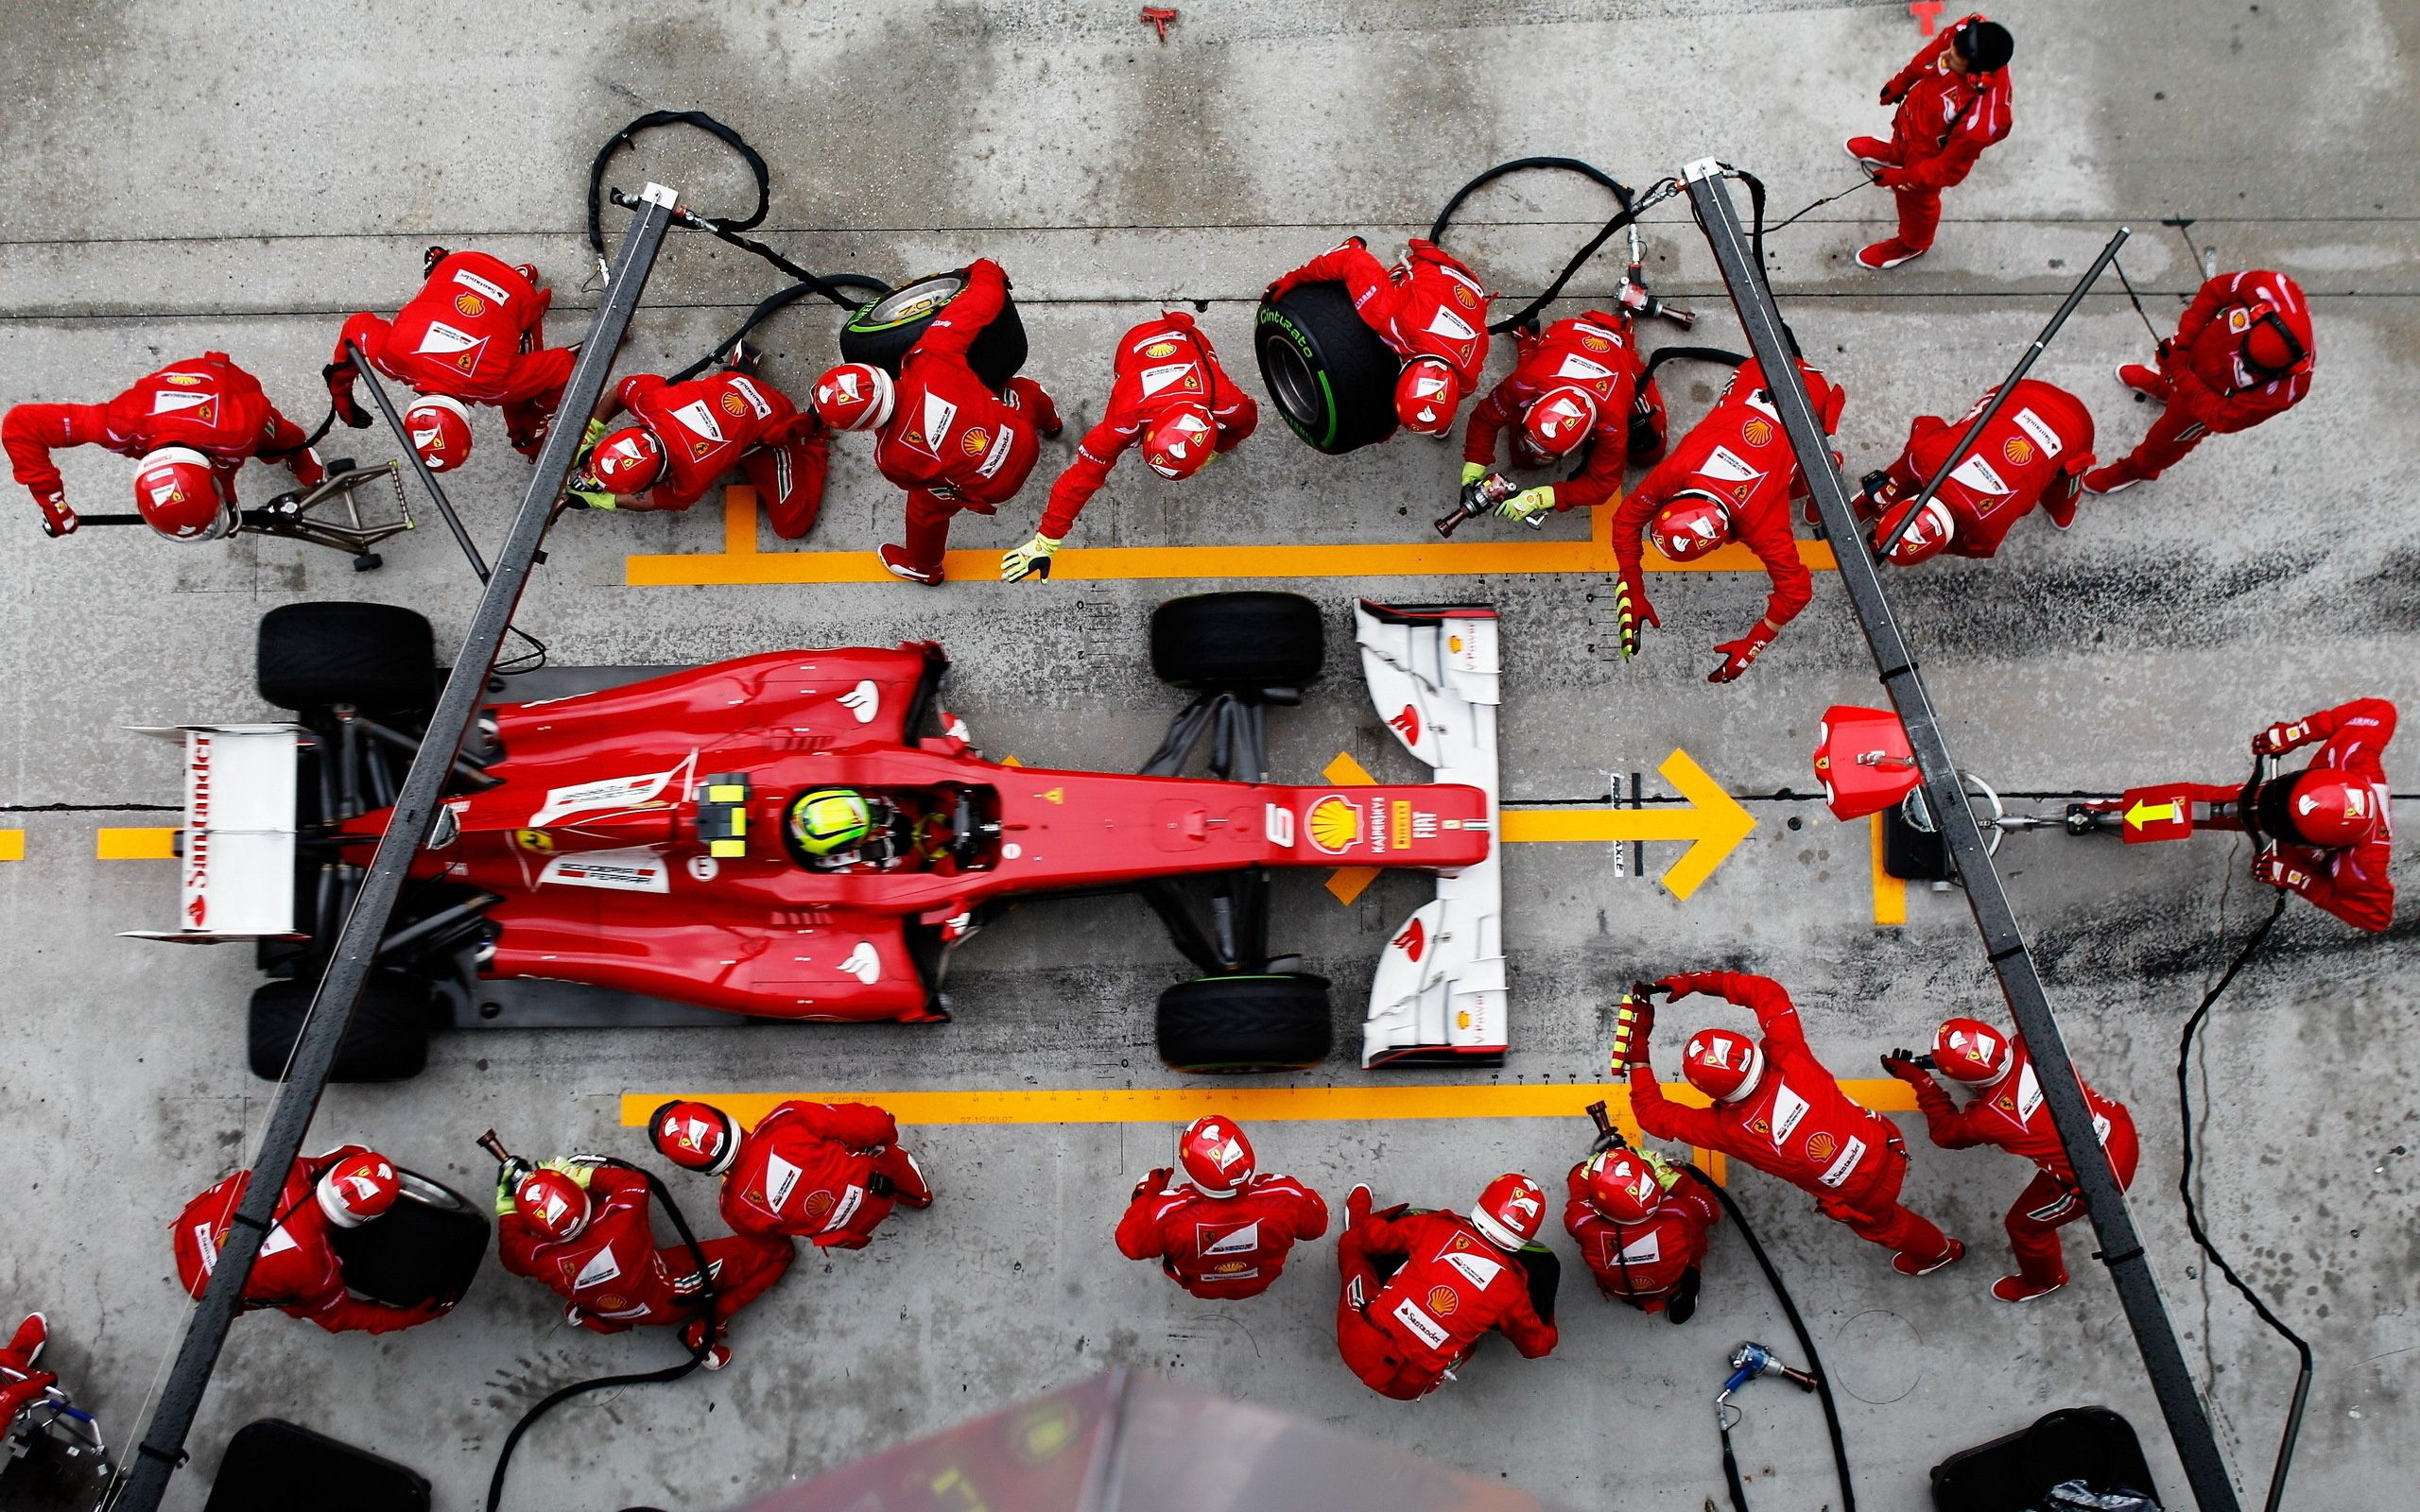 94763 Screensavers and Wallpapers Races for phone. Download Sports, Races, Ferrari, Kuala Lumpur, Malaysia, Formula One, Felipe Mass, Felipe Massa pictures for free